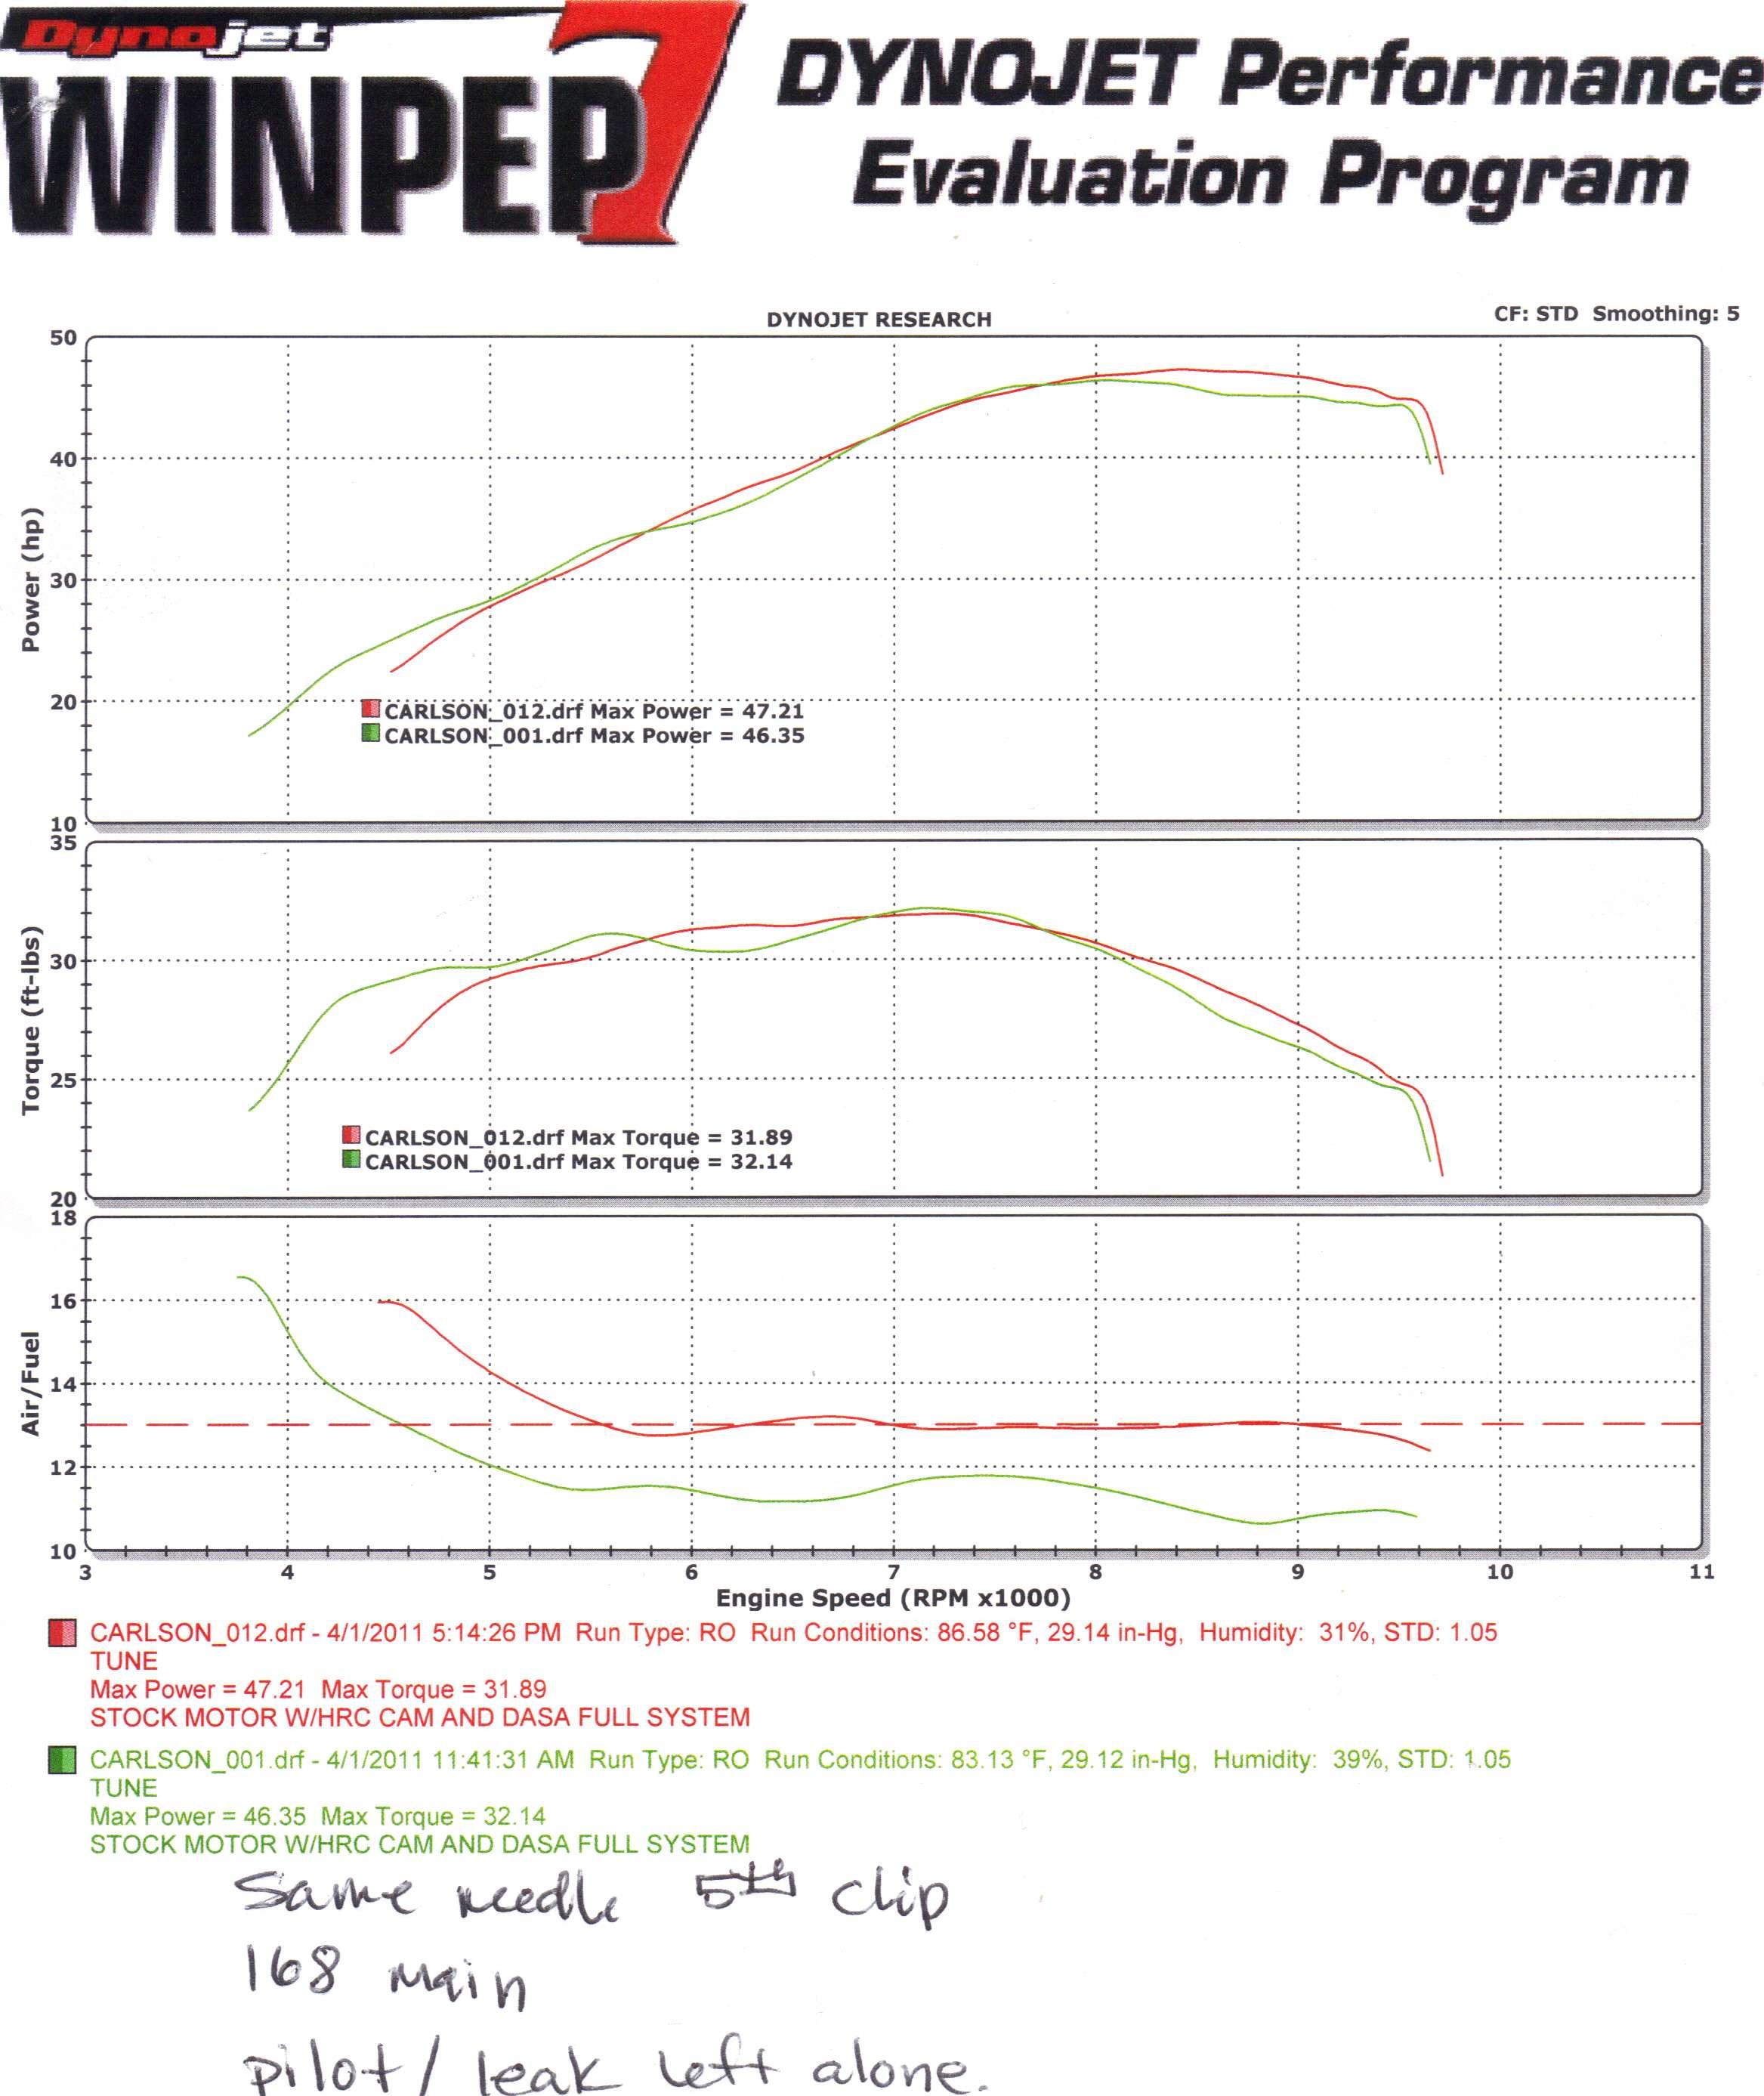 Lets Put An End To The Jetting Questions Honda Trx Forums 300ex Engine Camshaft Diagram Other Modshrc Cam Cdi Sub Harness Elevationsea Level Main Jet168 Pilot Jet45 Leak Jet55 Needle Clip Positionobel R 5th Fuel Screw2 1 8